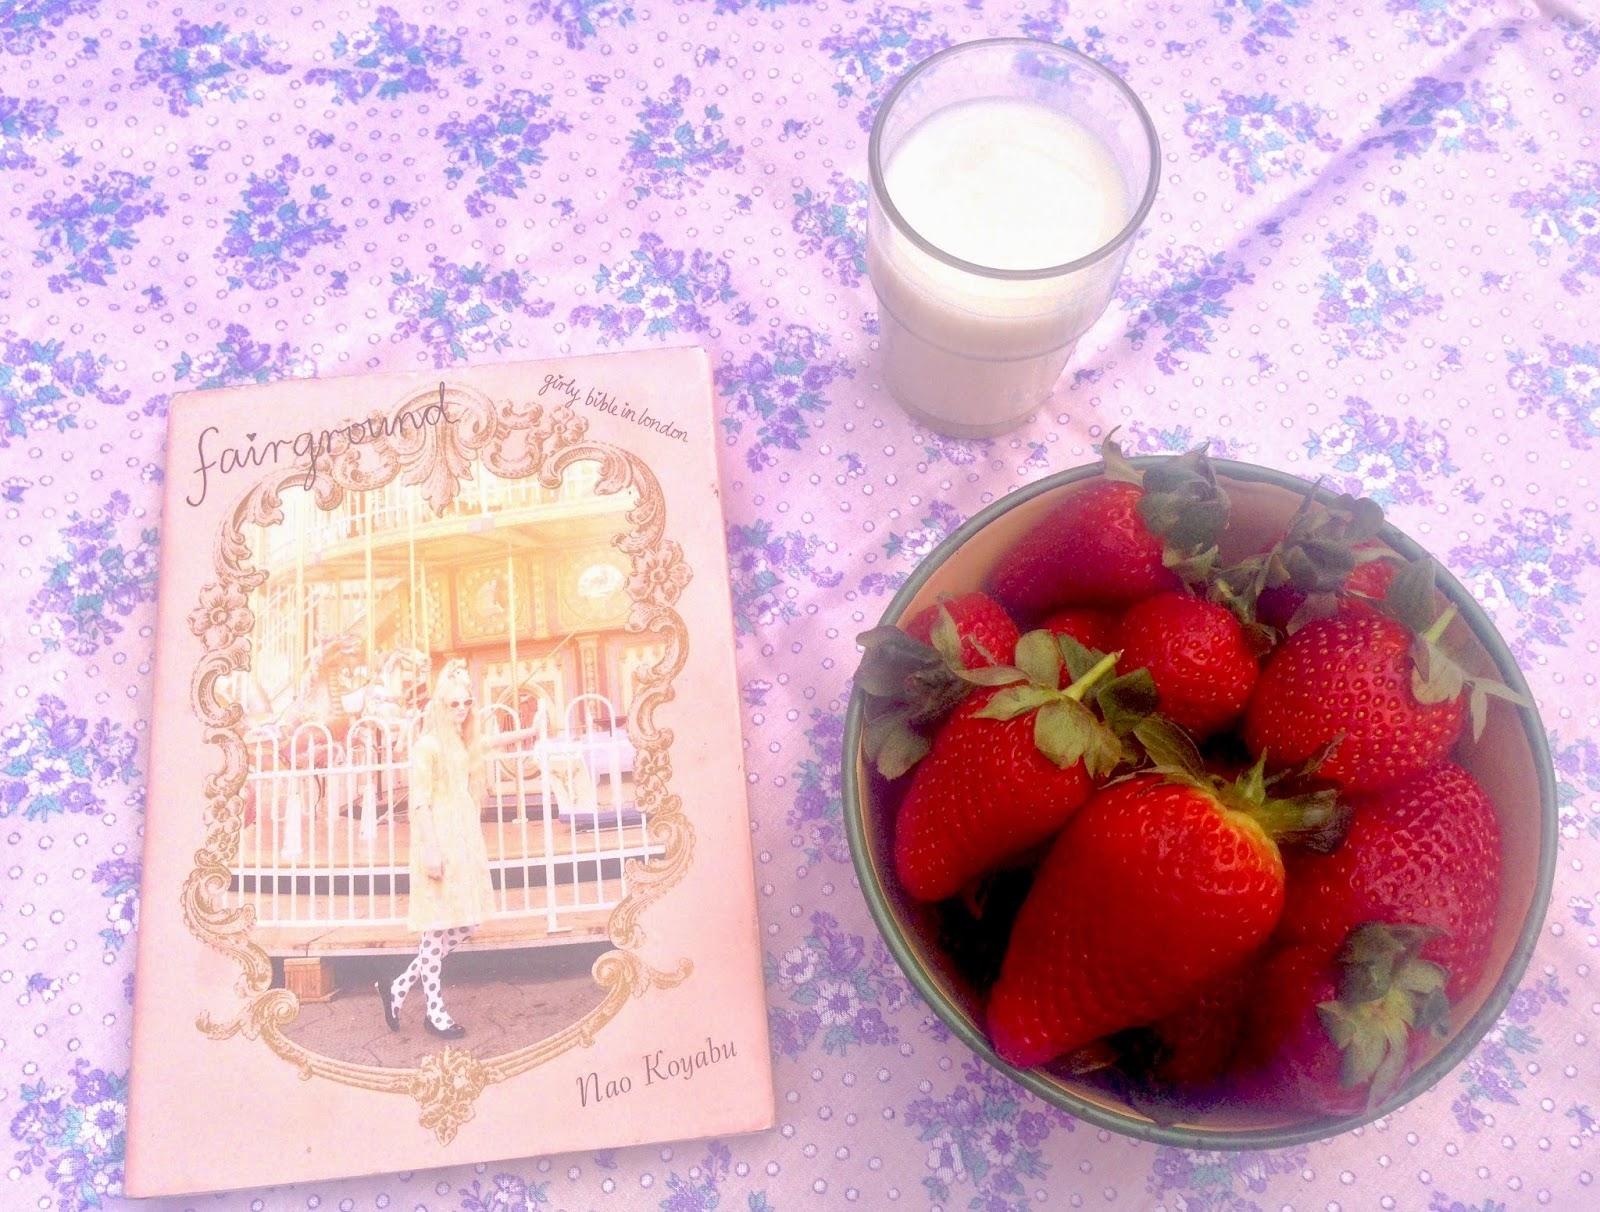 Strawberries & A Fairy Book